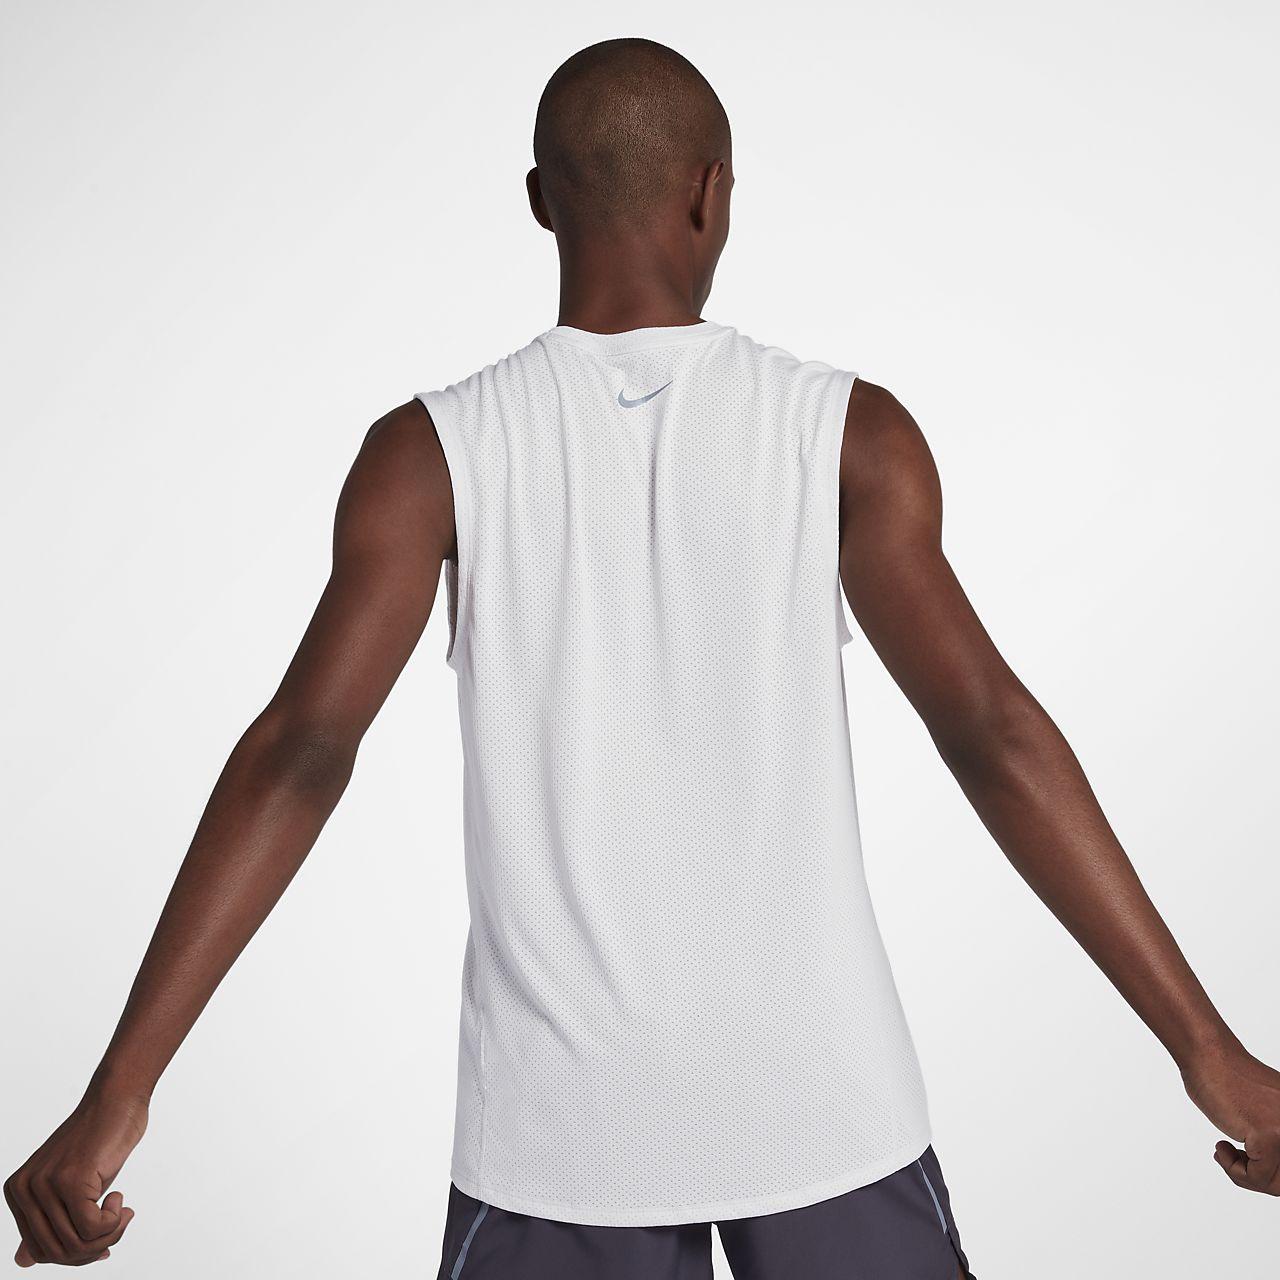 ec0c1e46226cb Nike Mens Miler Sleeveless Running Shirt – EDGE Engineering and ...